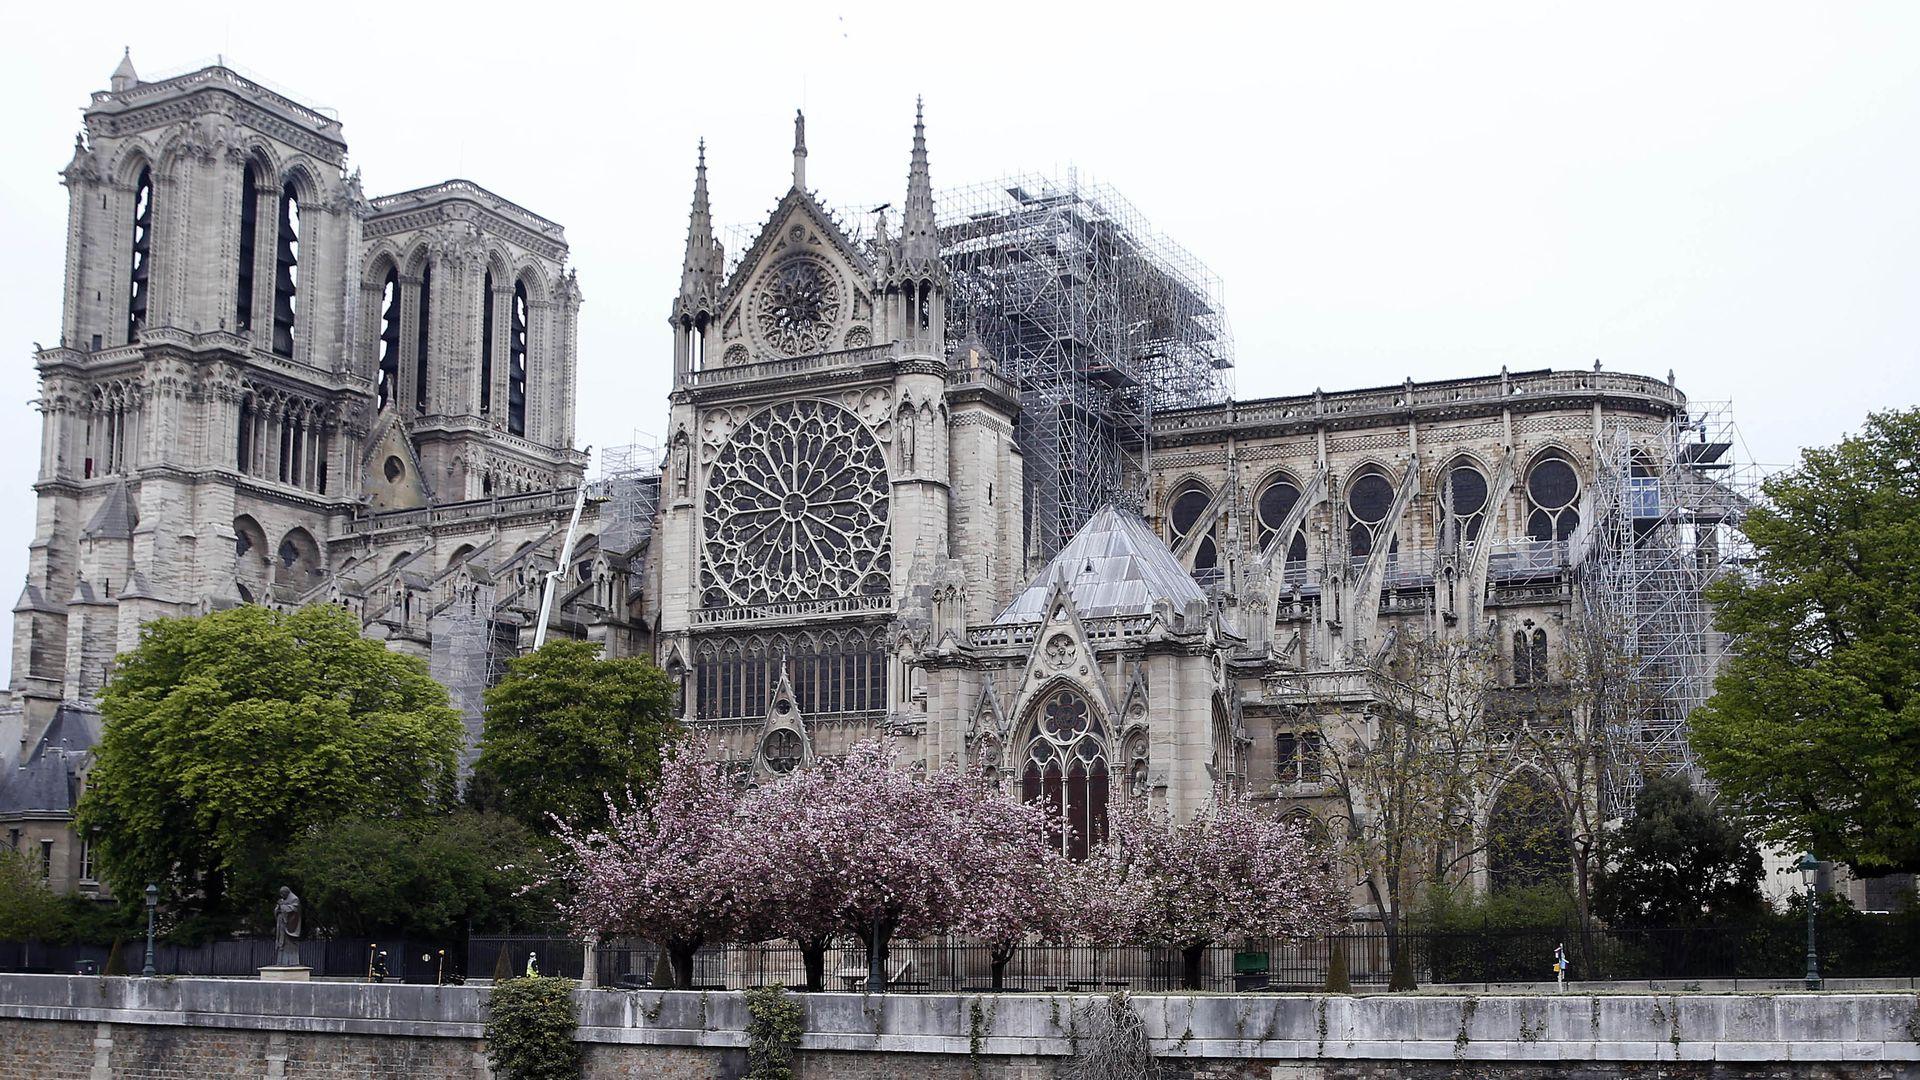 The Notre Dame damage